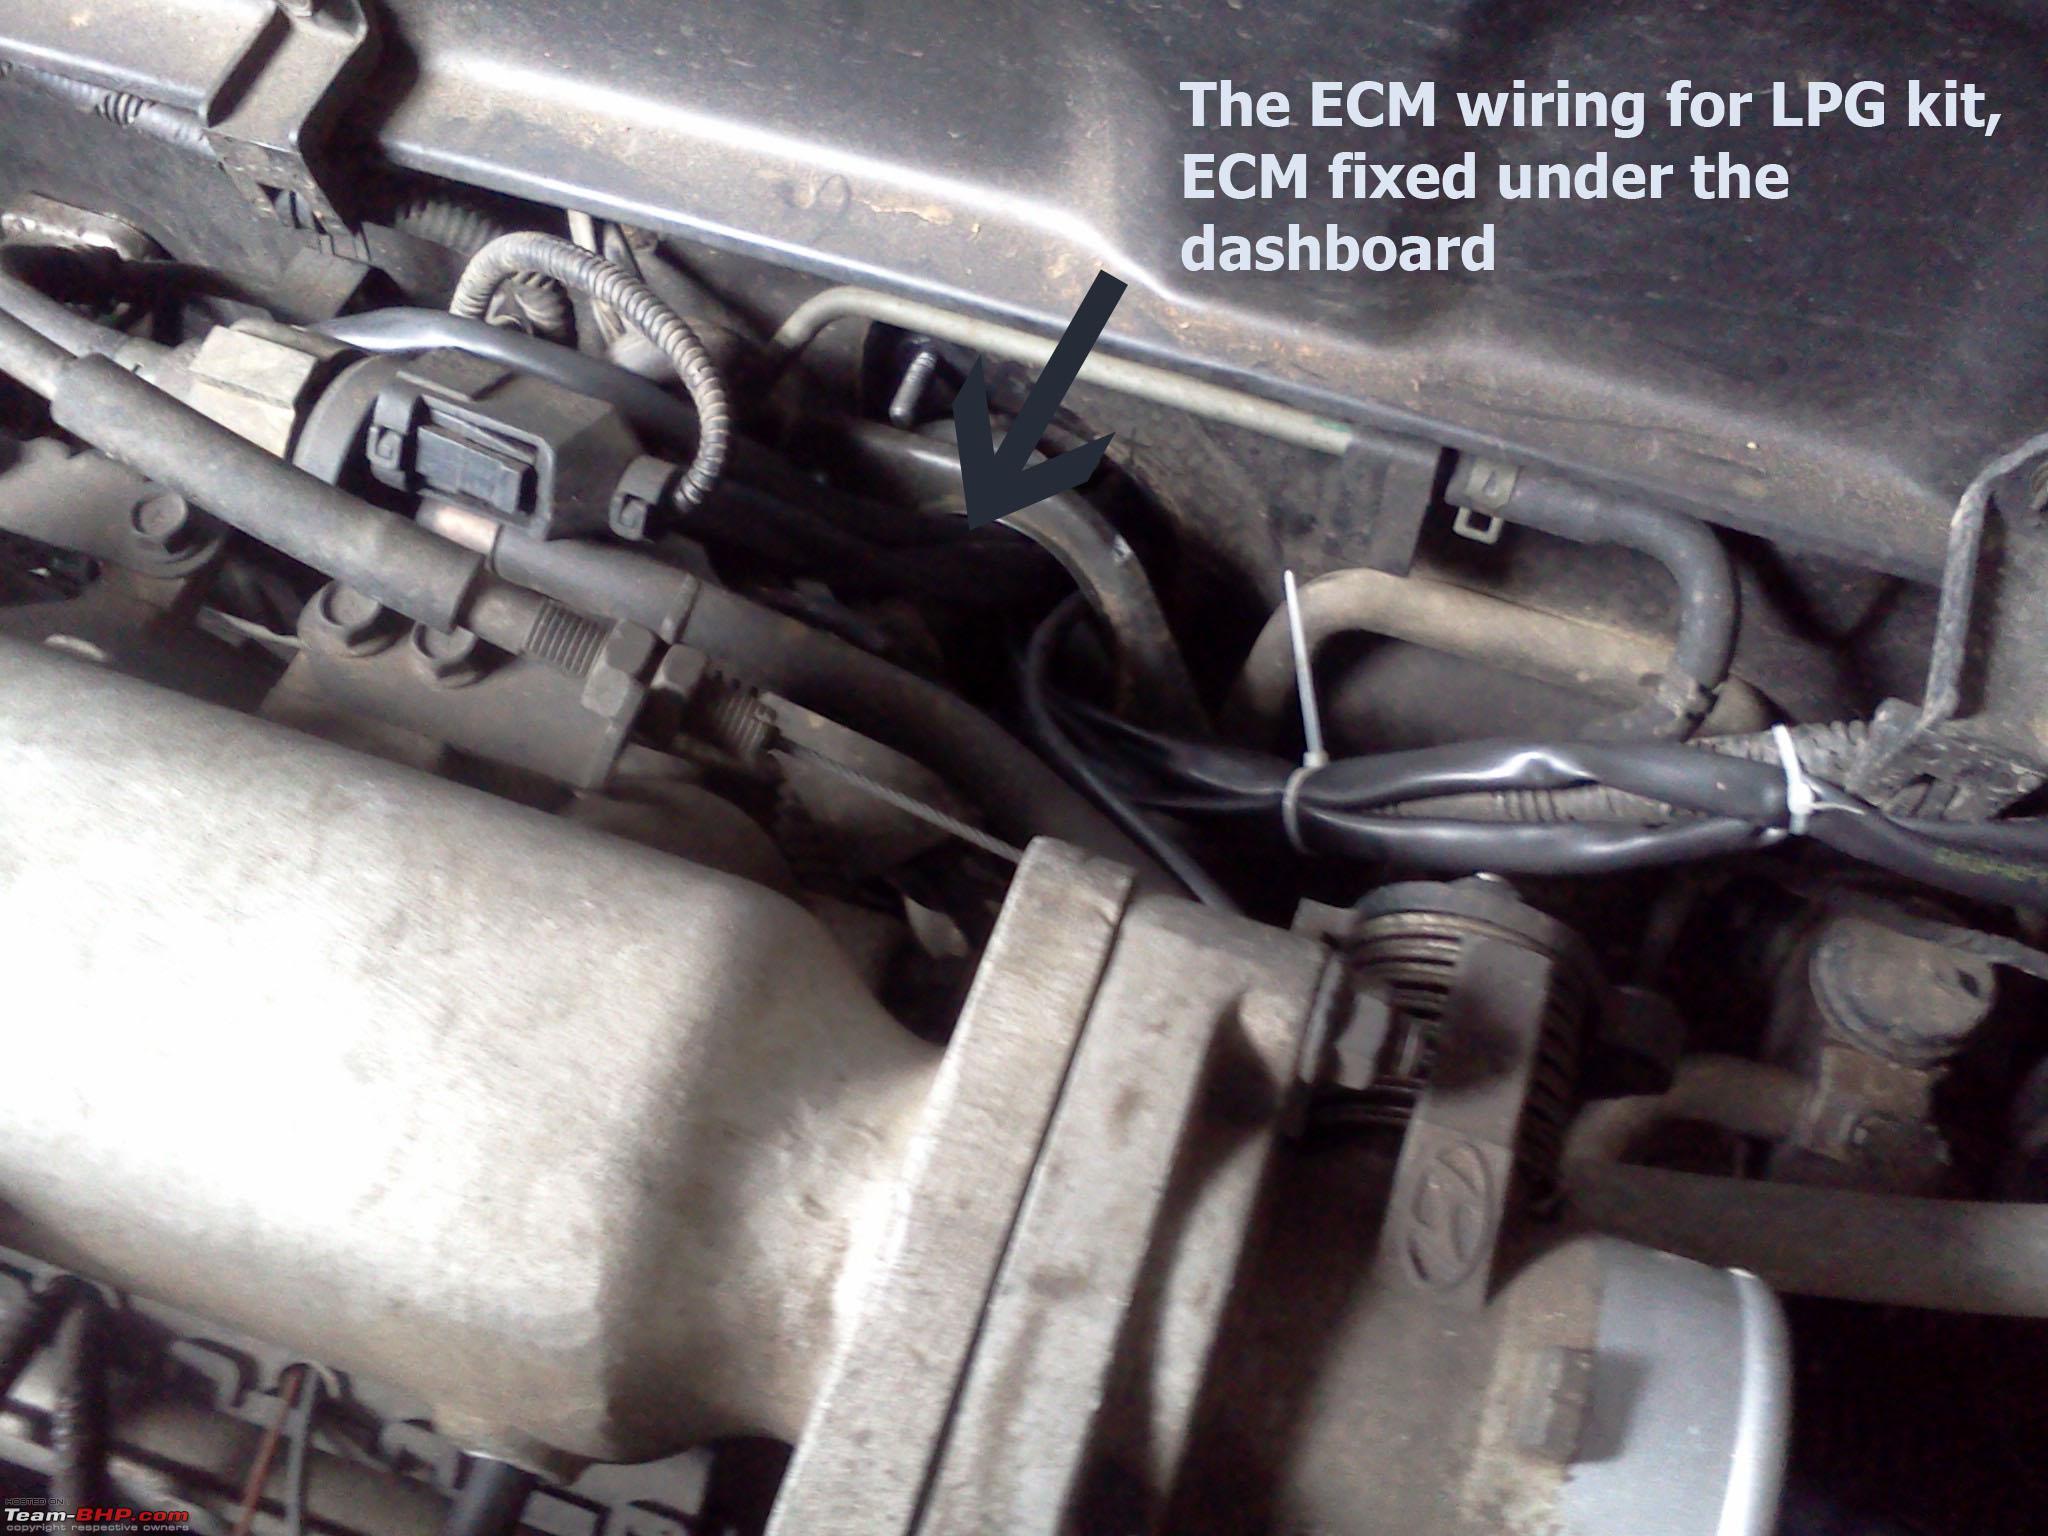 1987 Winnebago Wiring Diagram 88029 Free Download Harness Nissan Sentra Alternator Electrical Diagrams At